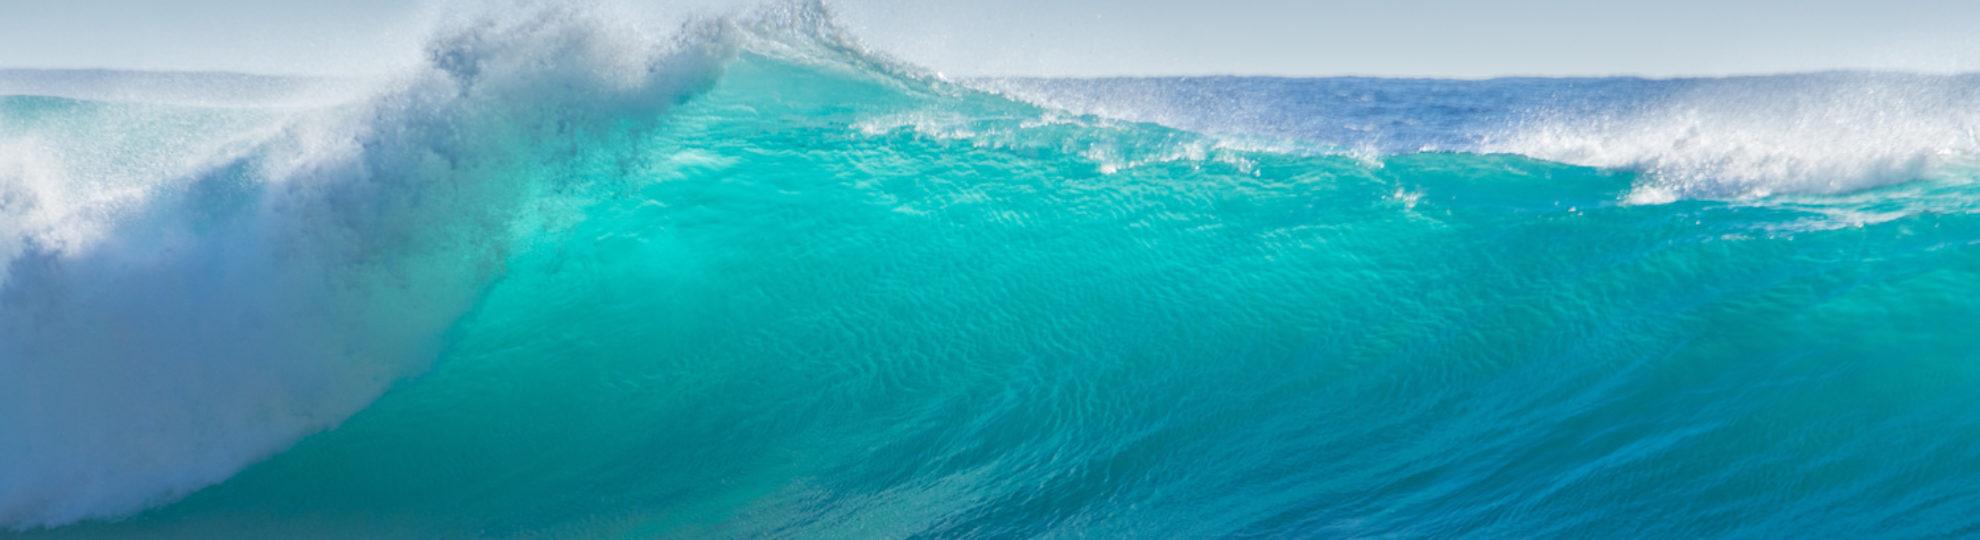 Kreuzfahrt Buchungen | Seereise buchen